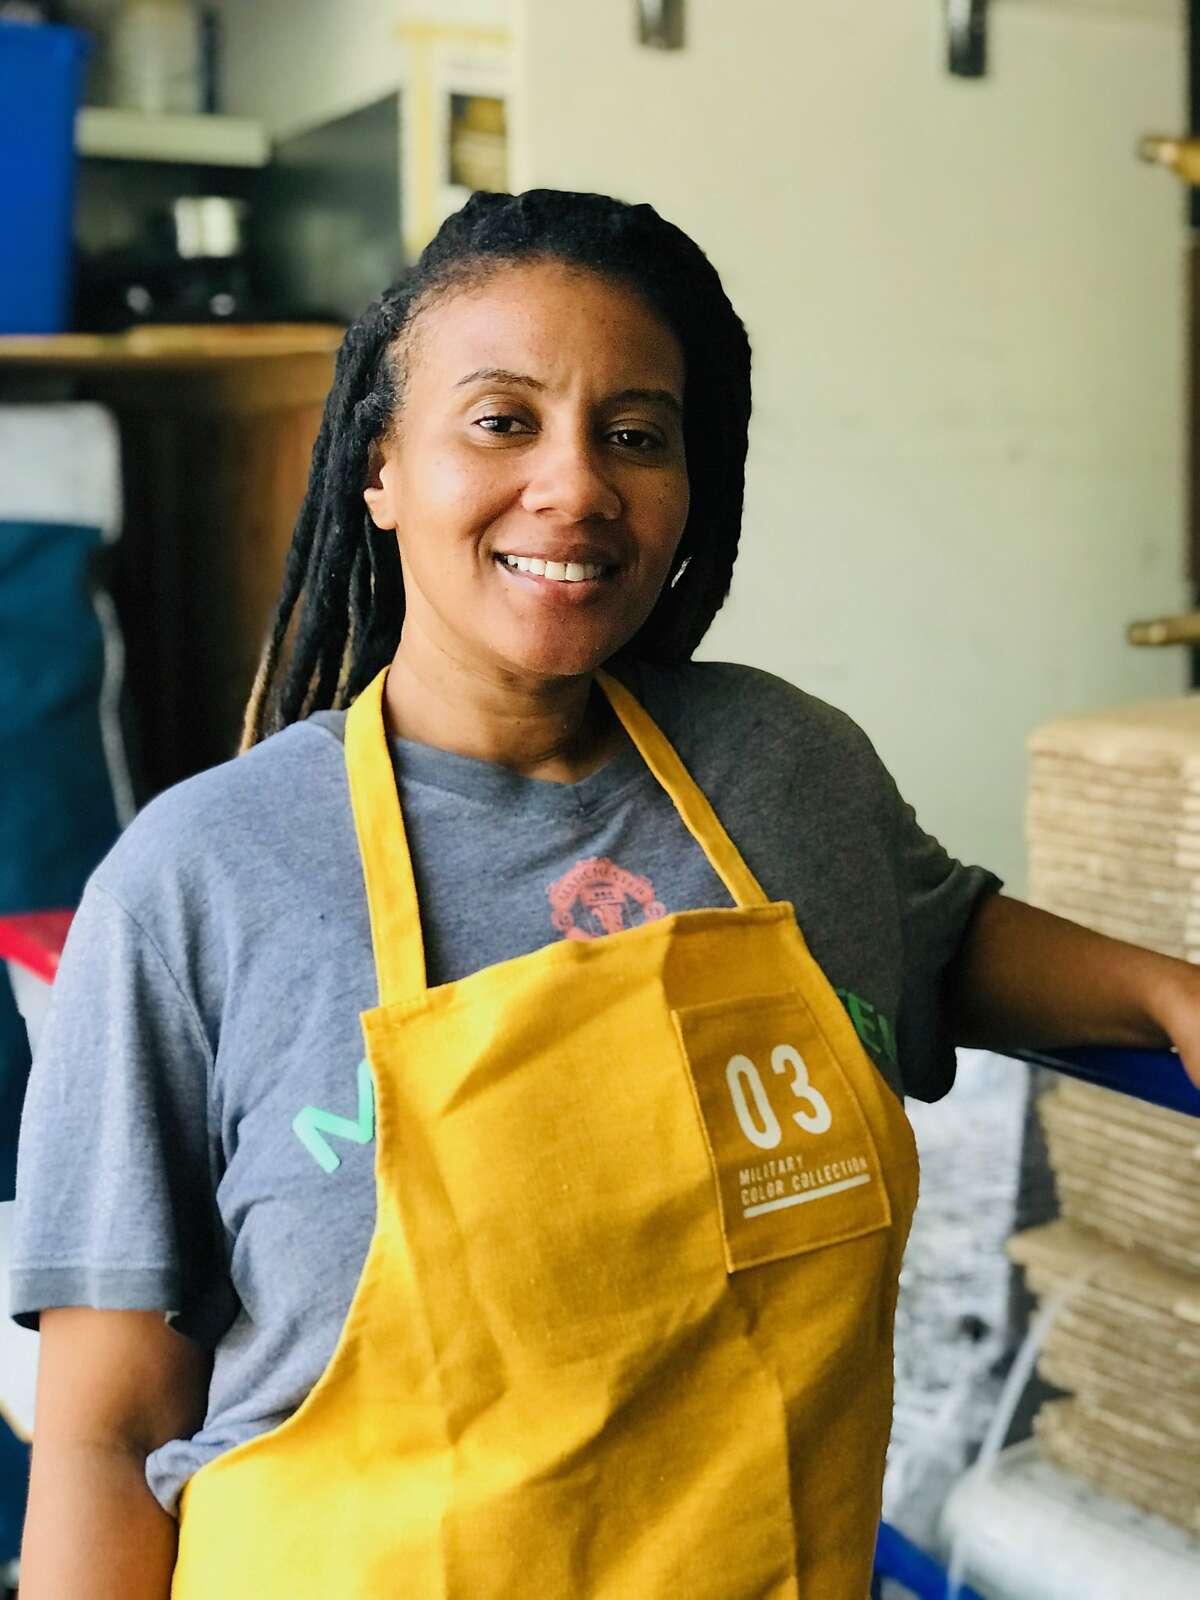 Tiffany Carter will open her first Boug Cali brick and mortar store at La Cocina Municipal Marketplace in San Francisco.